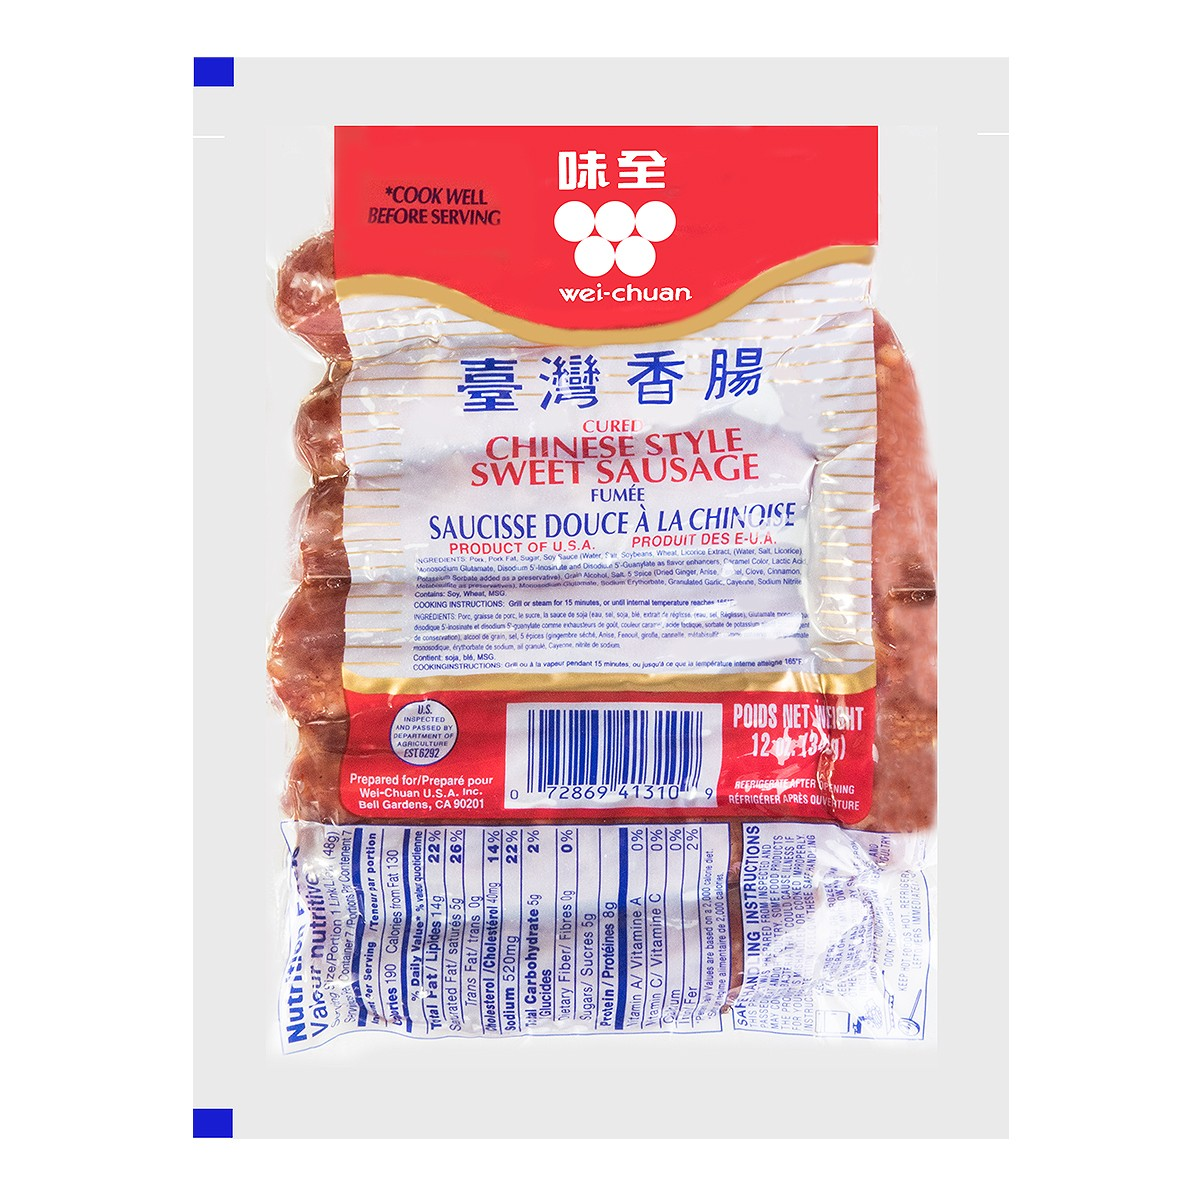 WEI CHUAN Sweet Sausage 340g